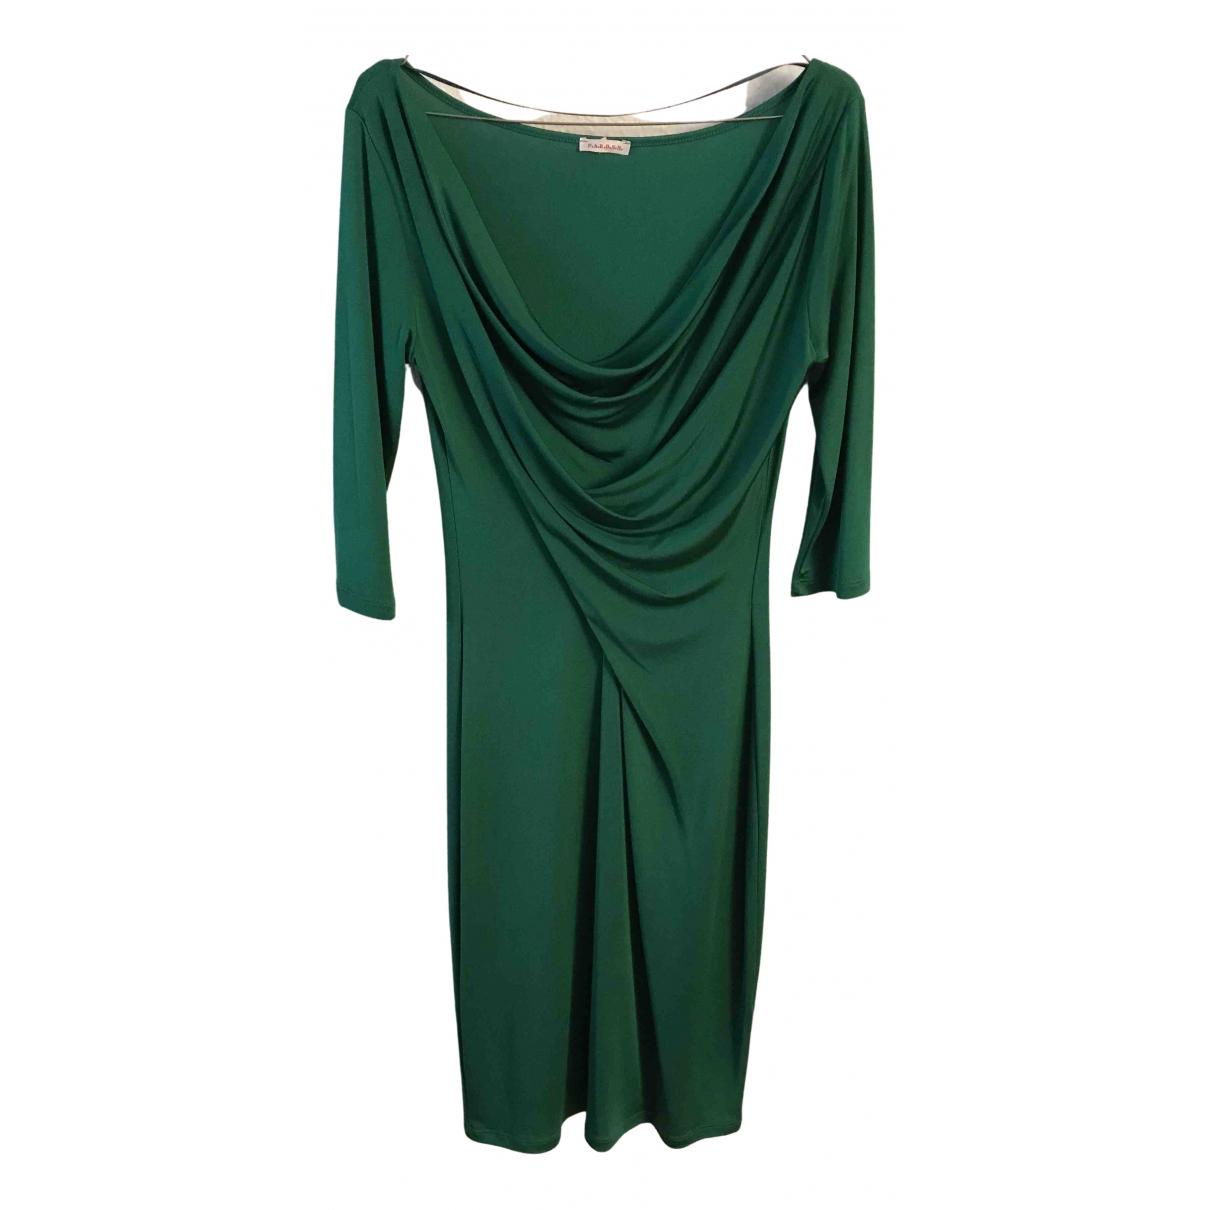 Parosh \N Kleid in  Gruen Seide